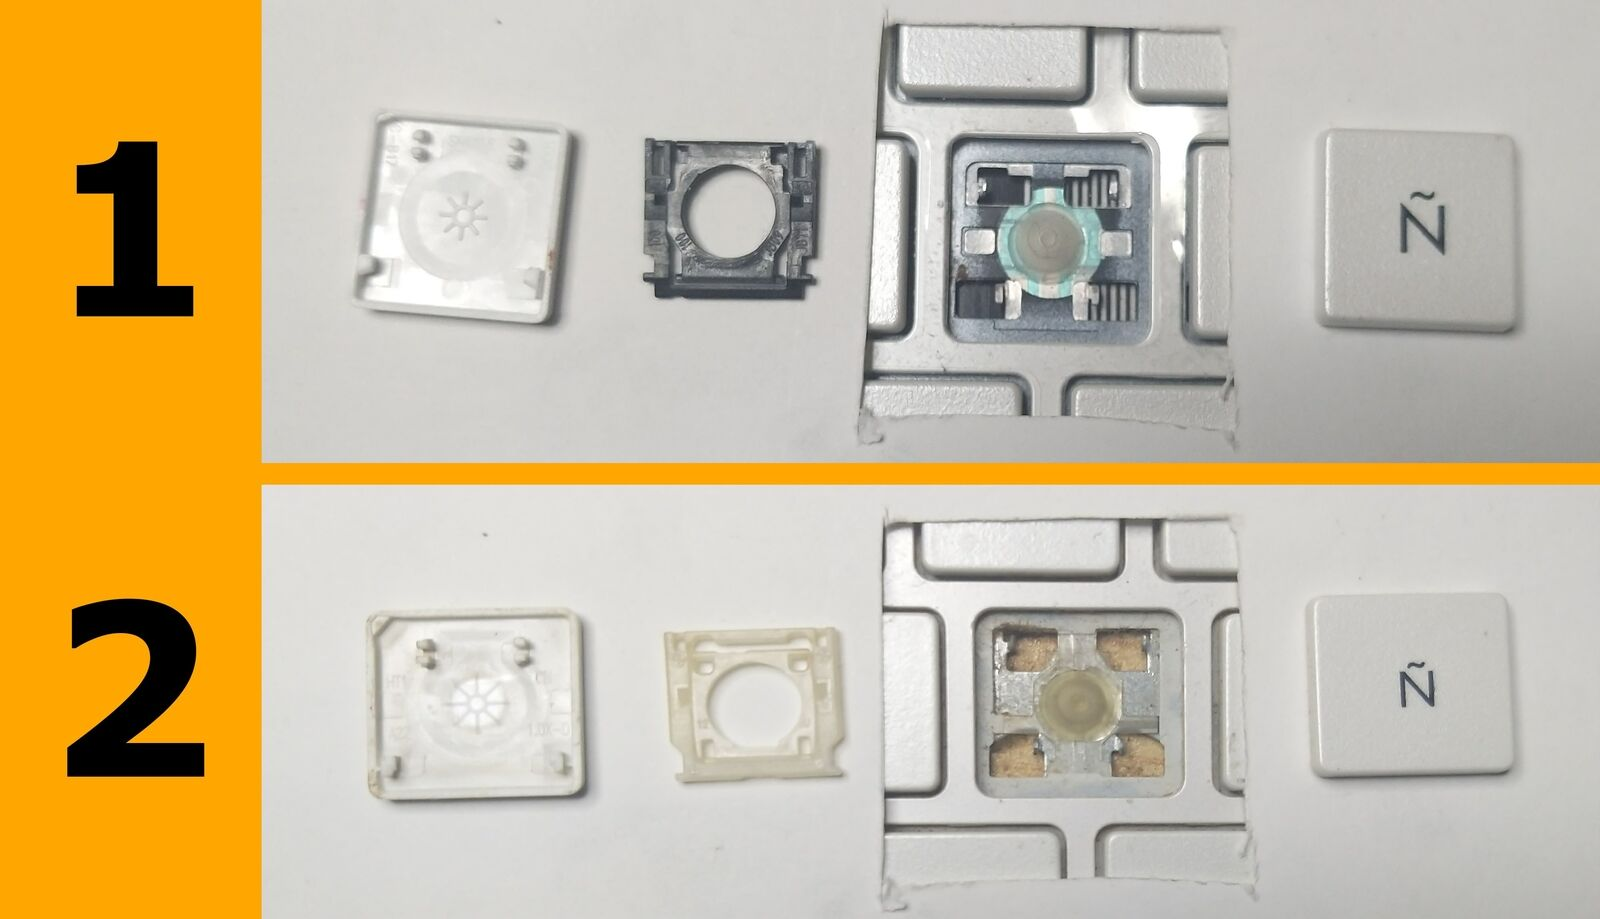 TECLA TECLAS DE TECLADO HP PAVILION G6 G6-2000 G6-2100 G6-2200 G6-2300 G6-2101A